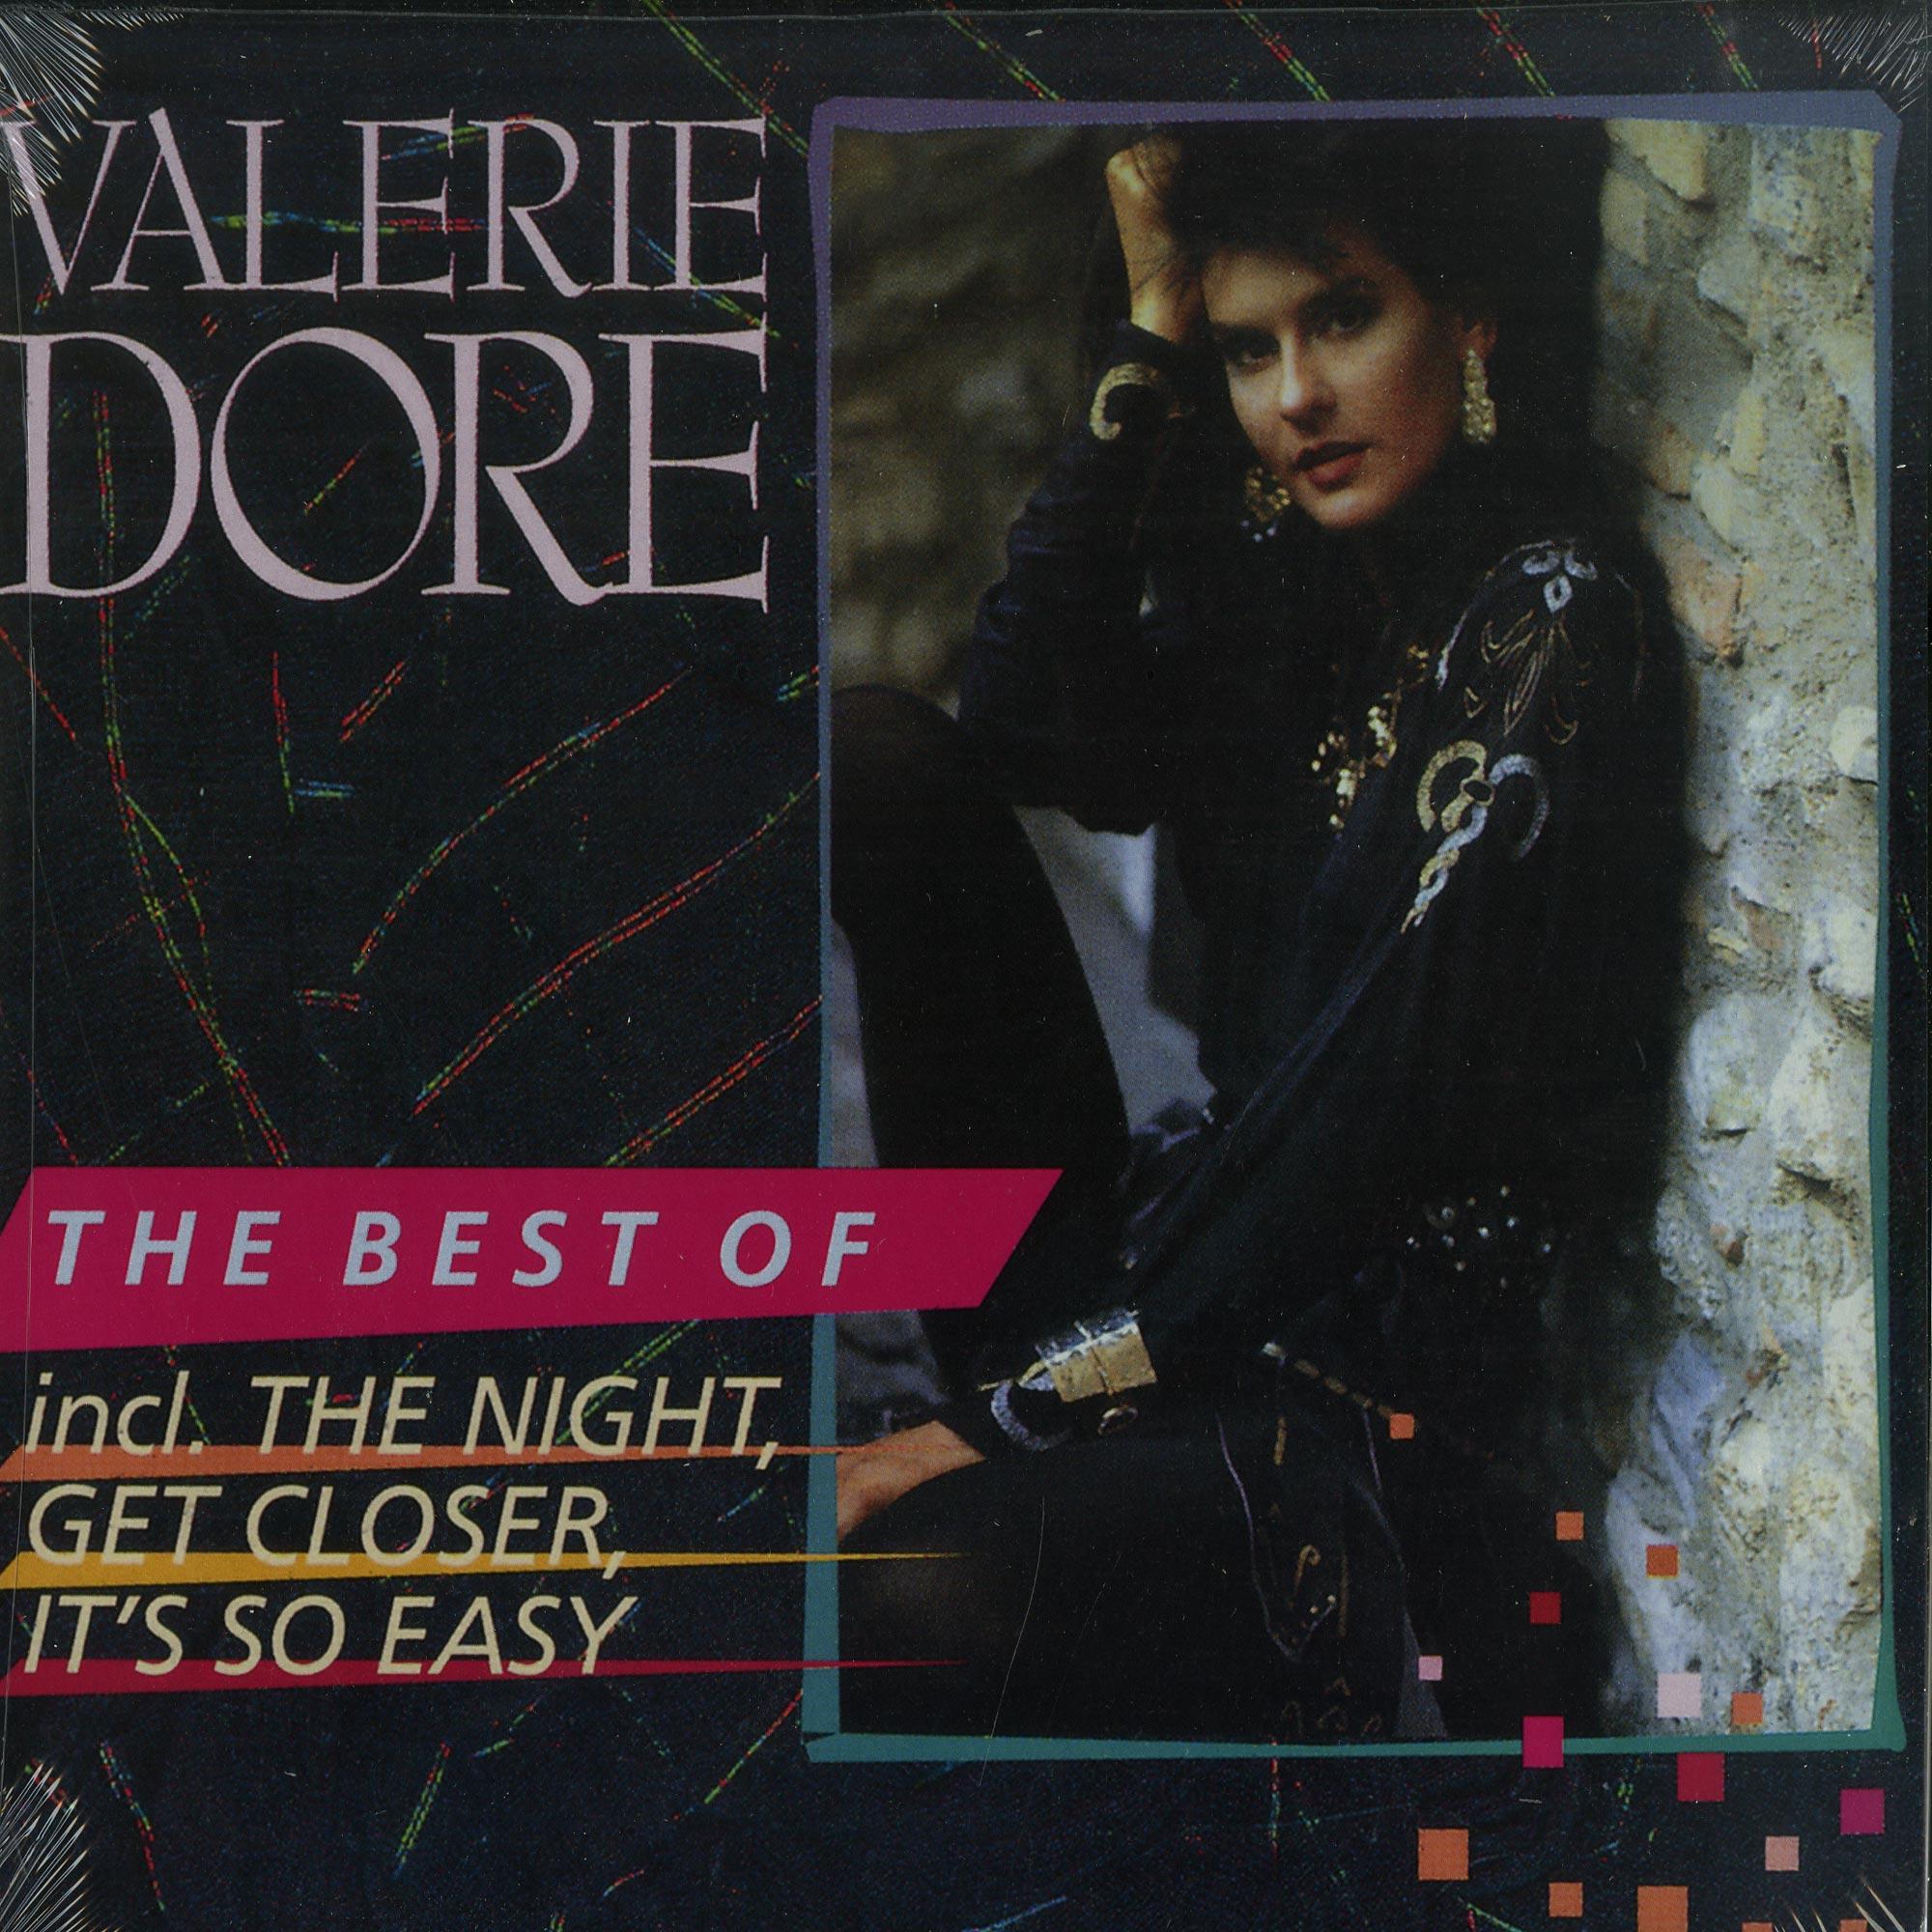 Valerie Dore - THE BEST OF VALERIE DORE